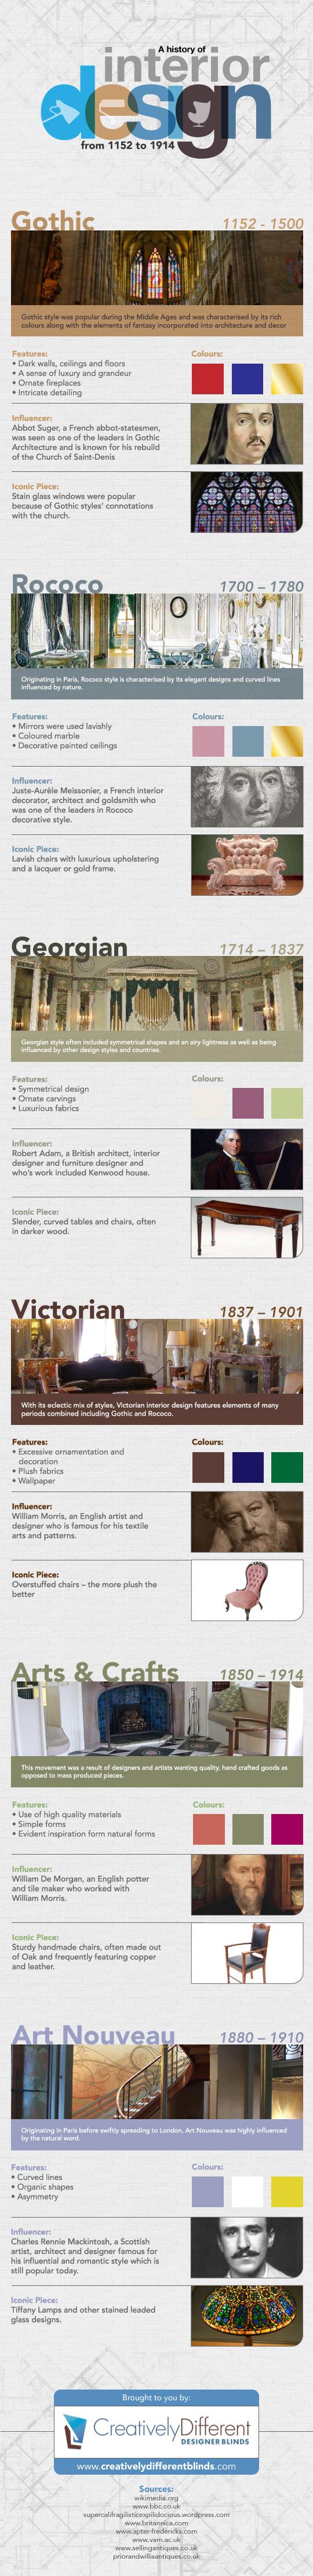 interior design history